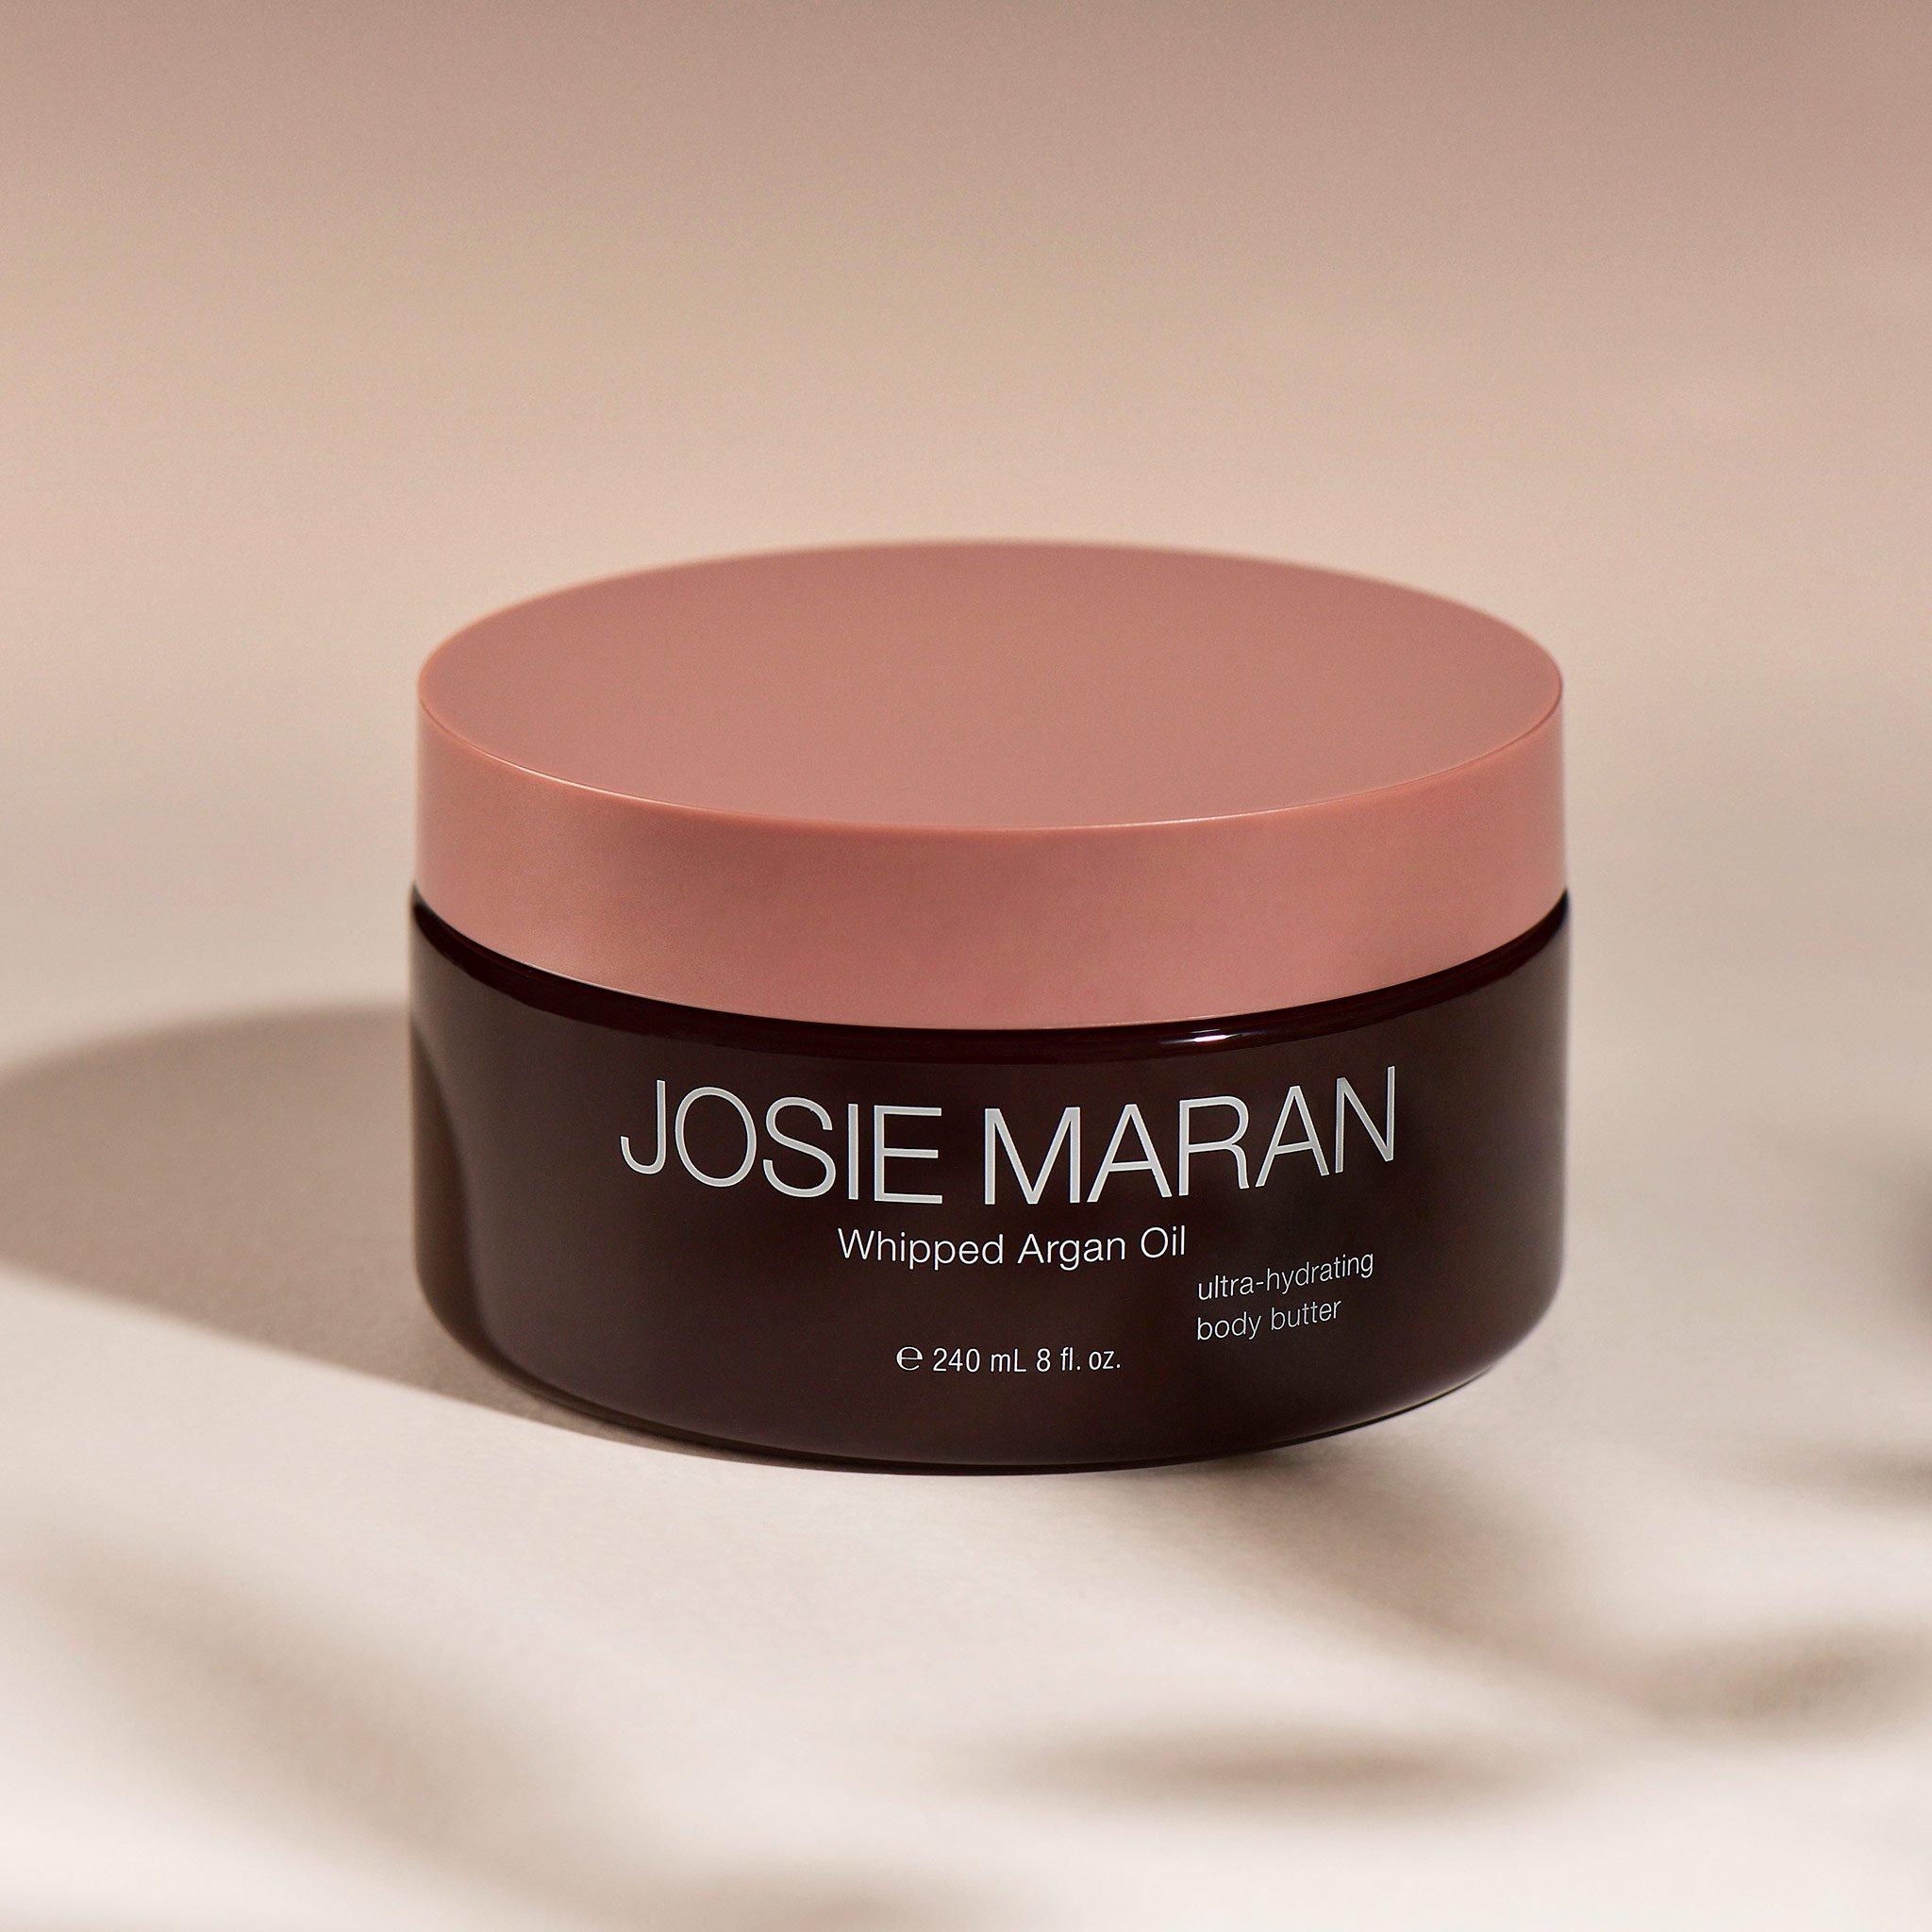 Josie Maran Whipped Argan Oil Body Butter